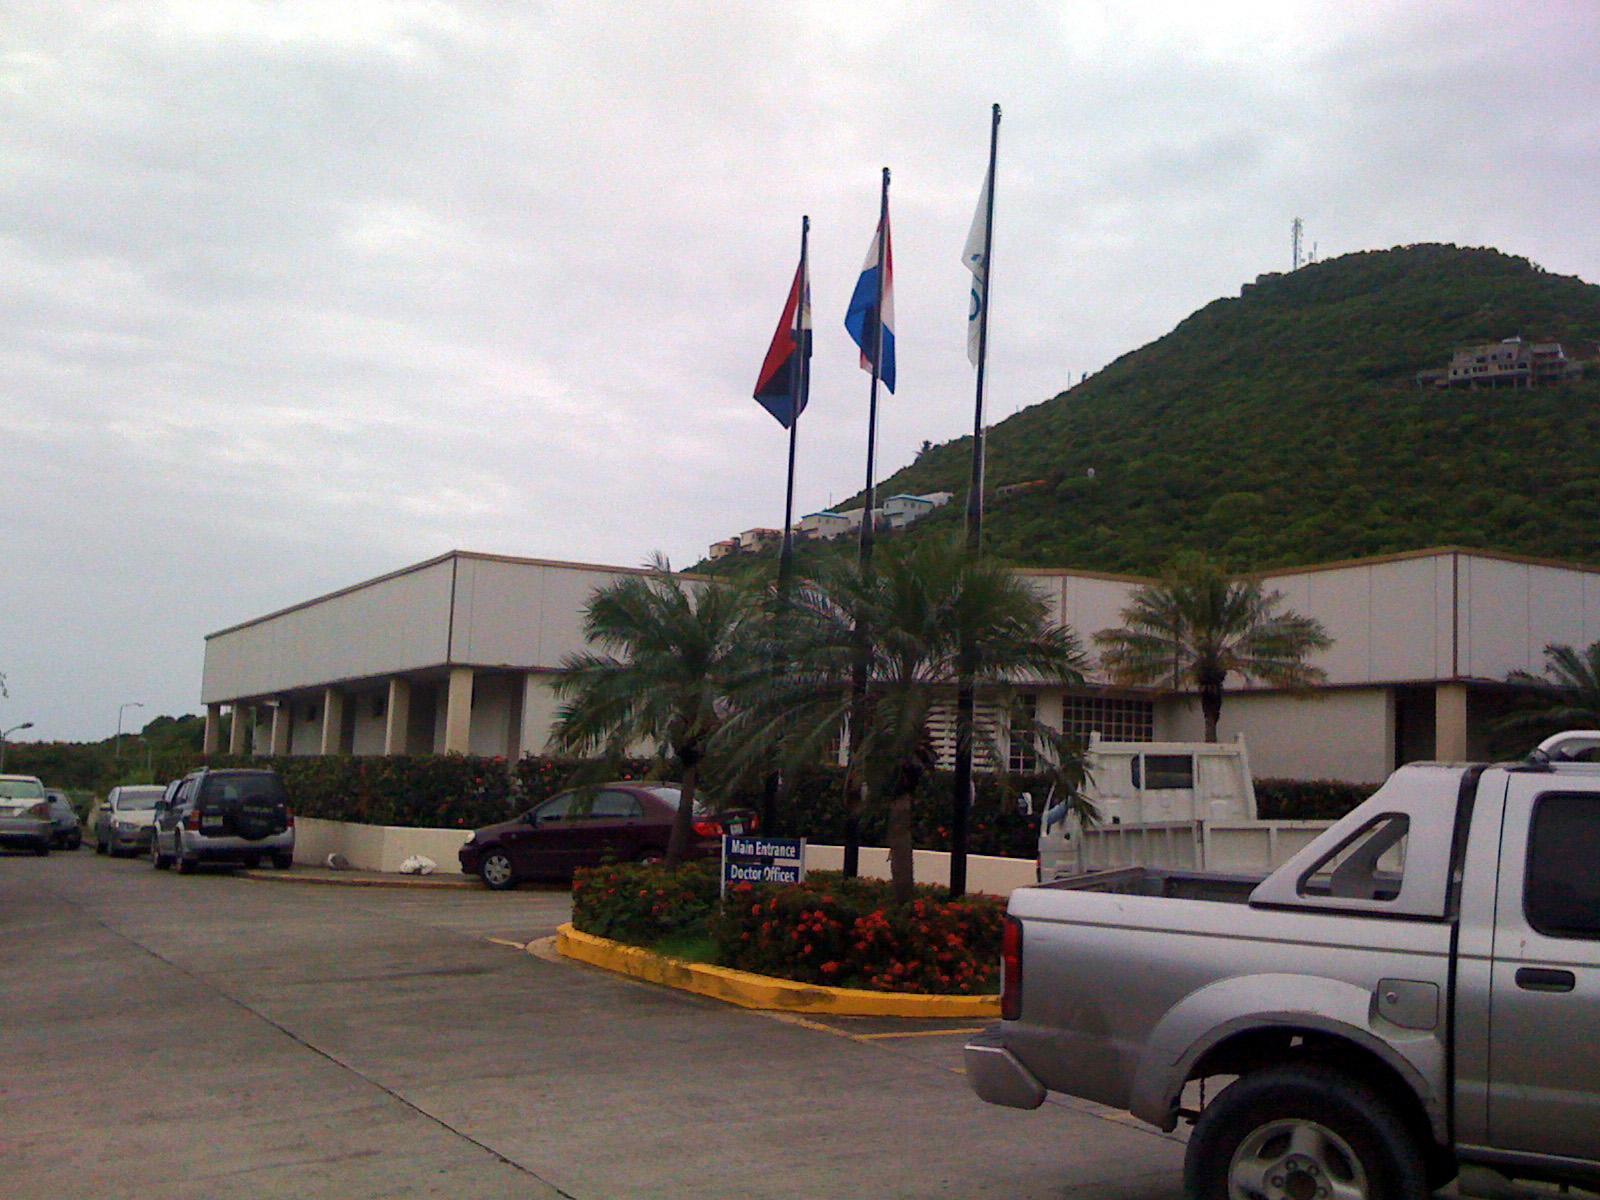 Entrance to St. Maarten Medical Center